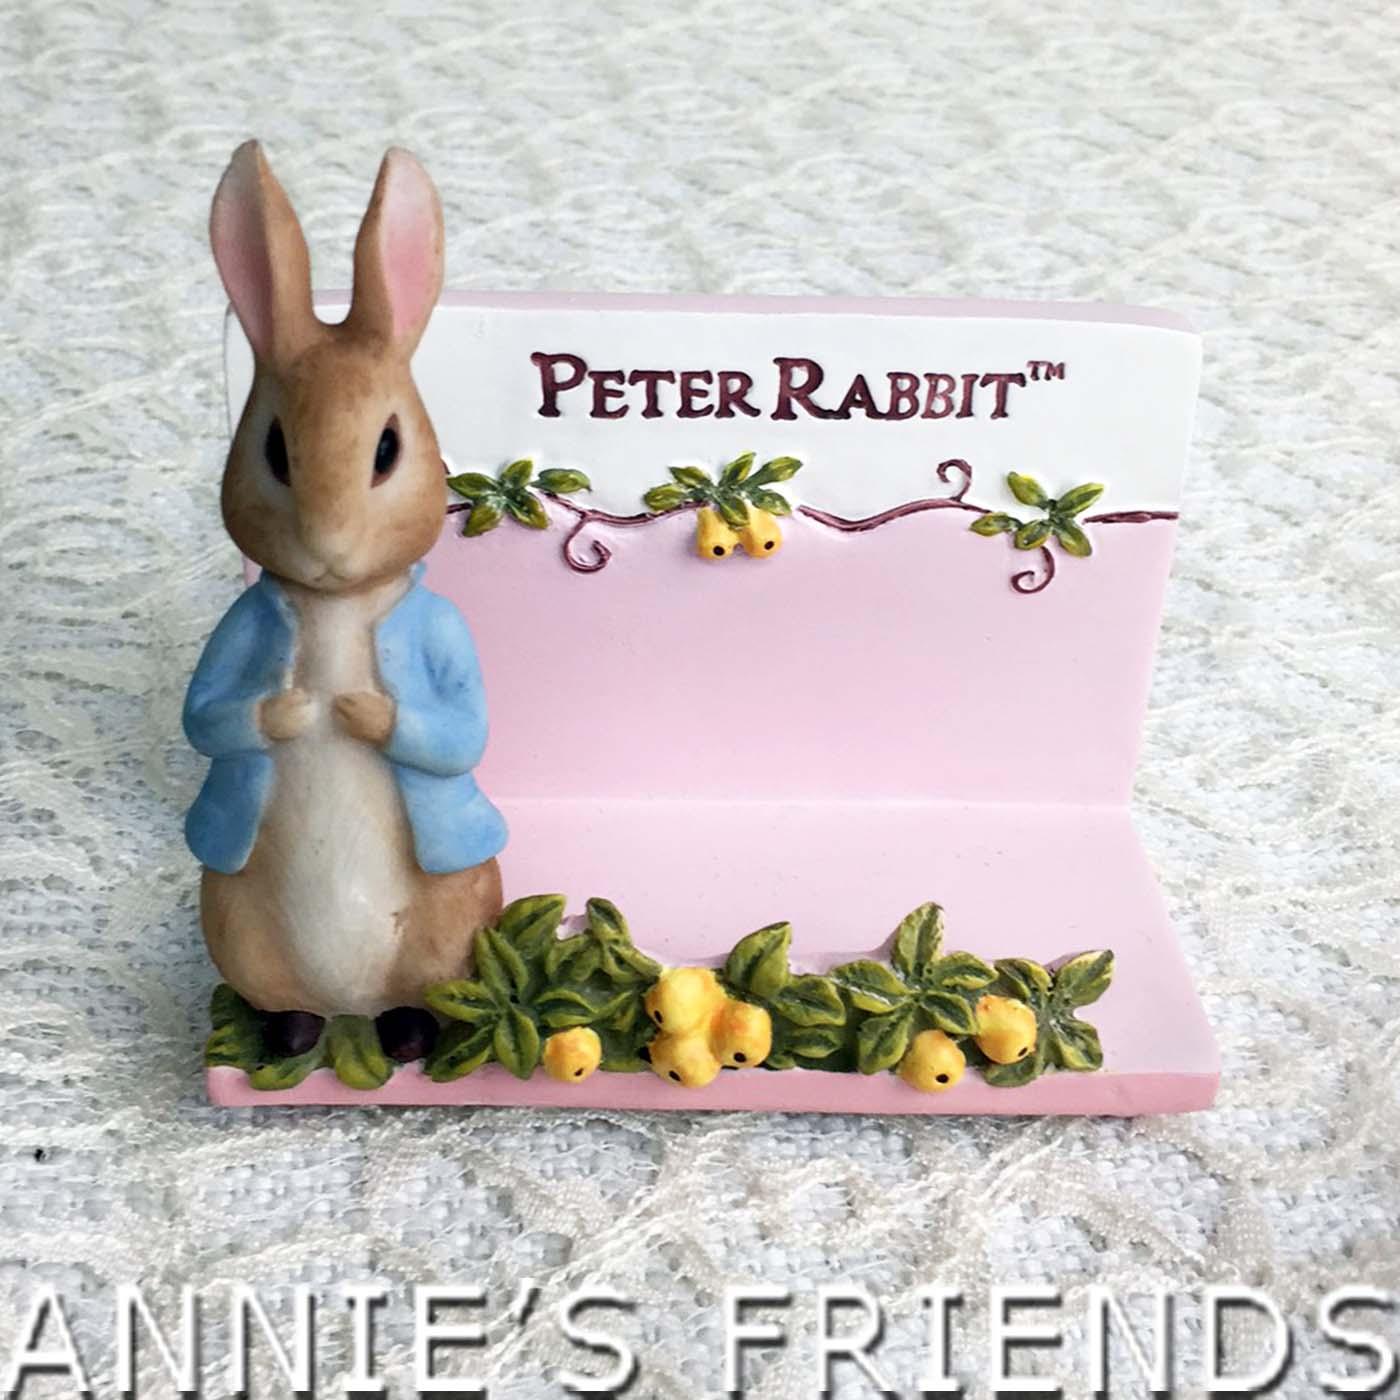 AnniesFriends 彼得兔 Peter Rabbit 金桔粉色名片座 浪漫 典雅 玫瑰 鄉村風 傢飾